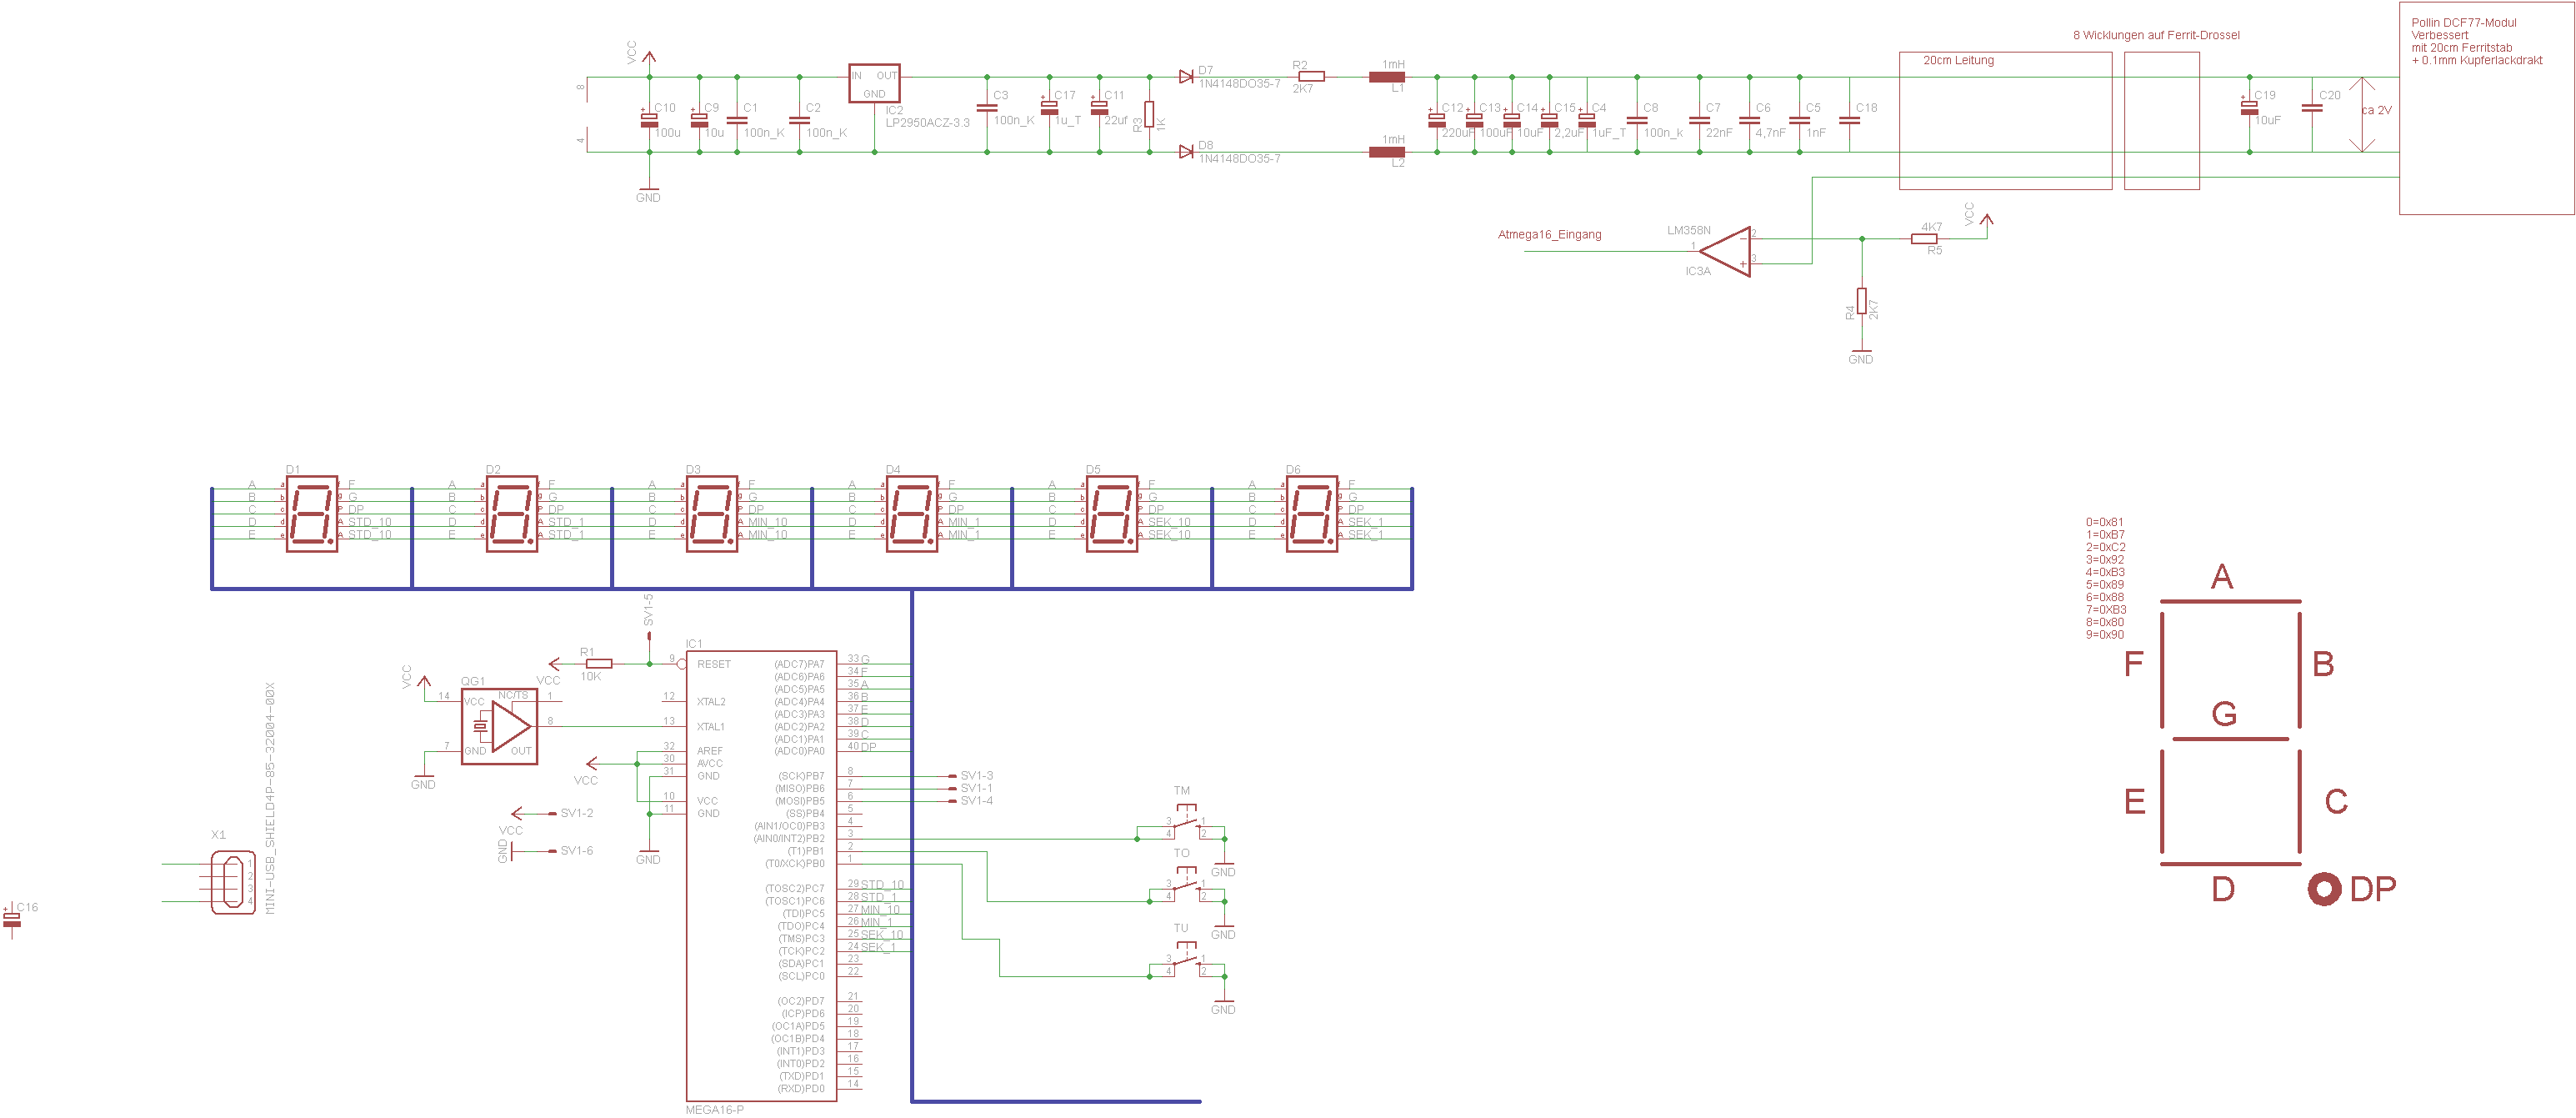 DCF77-Modul Empfang weiter verbessern. - Mikrocontroller.net